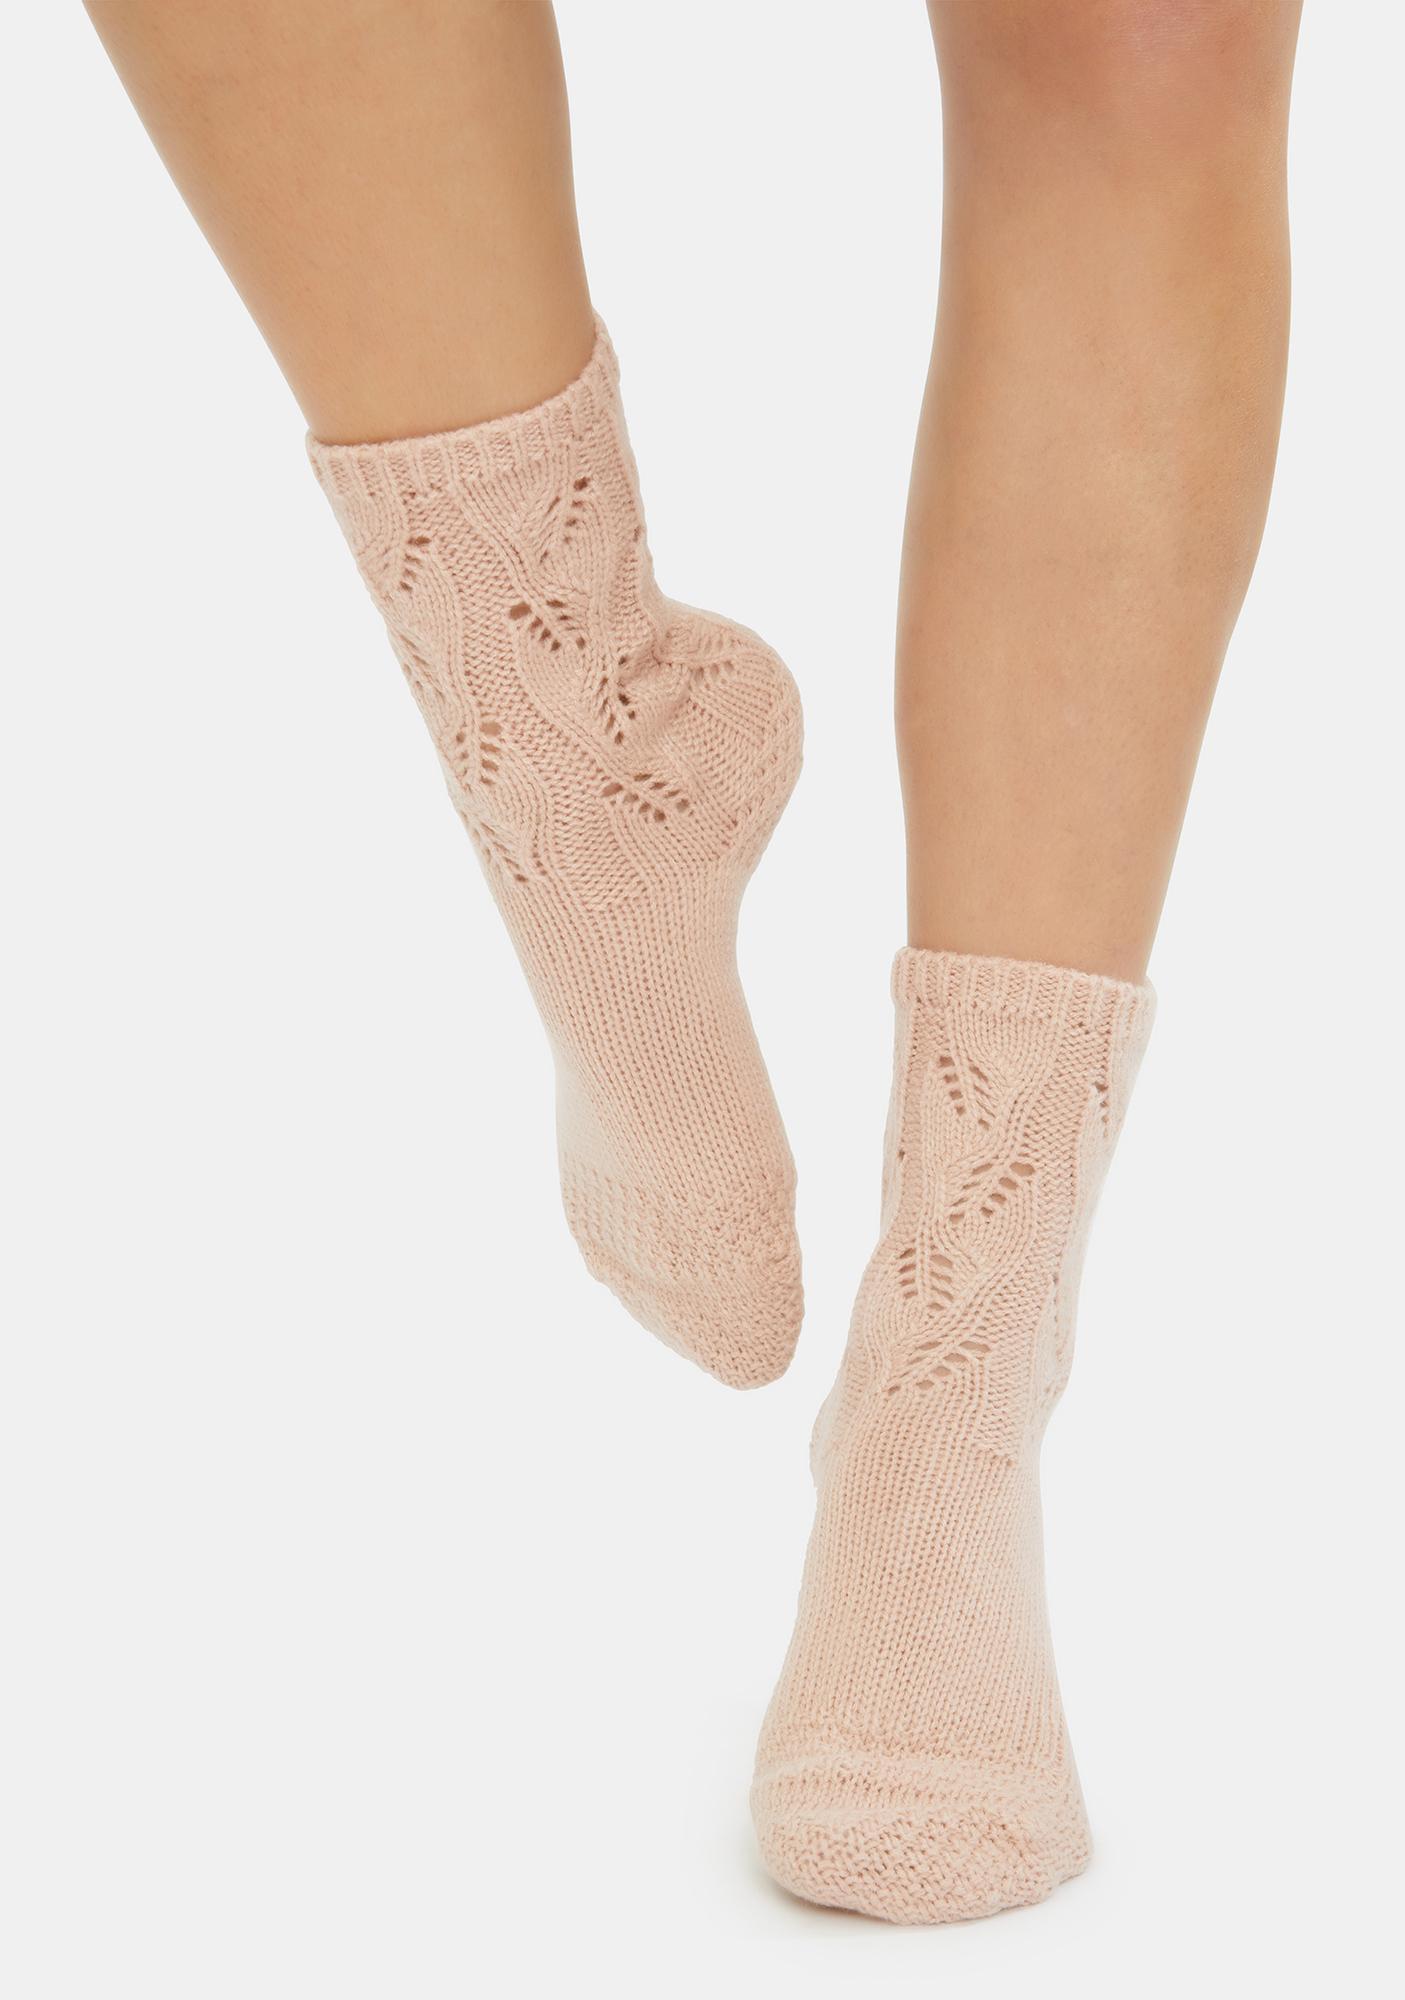 MeMoi Blush No Place Like Home Pointelle Crew Socks